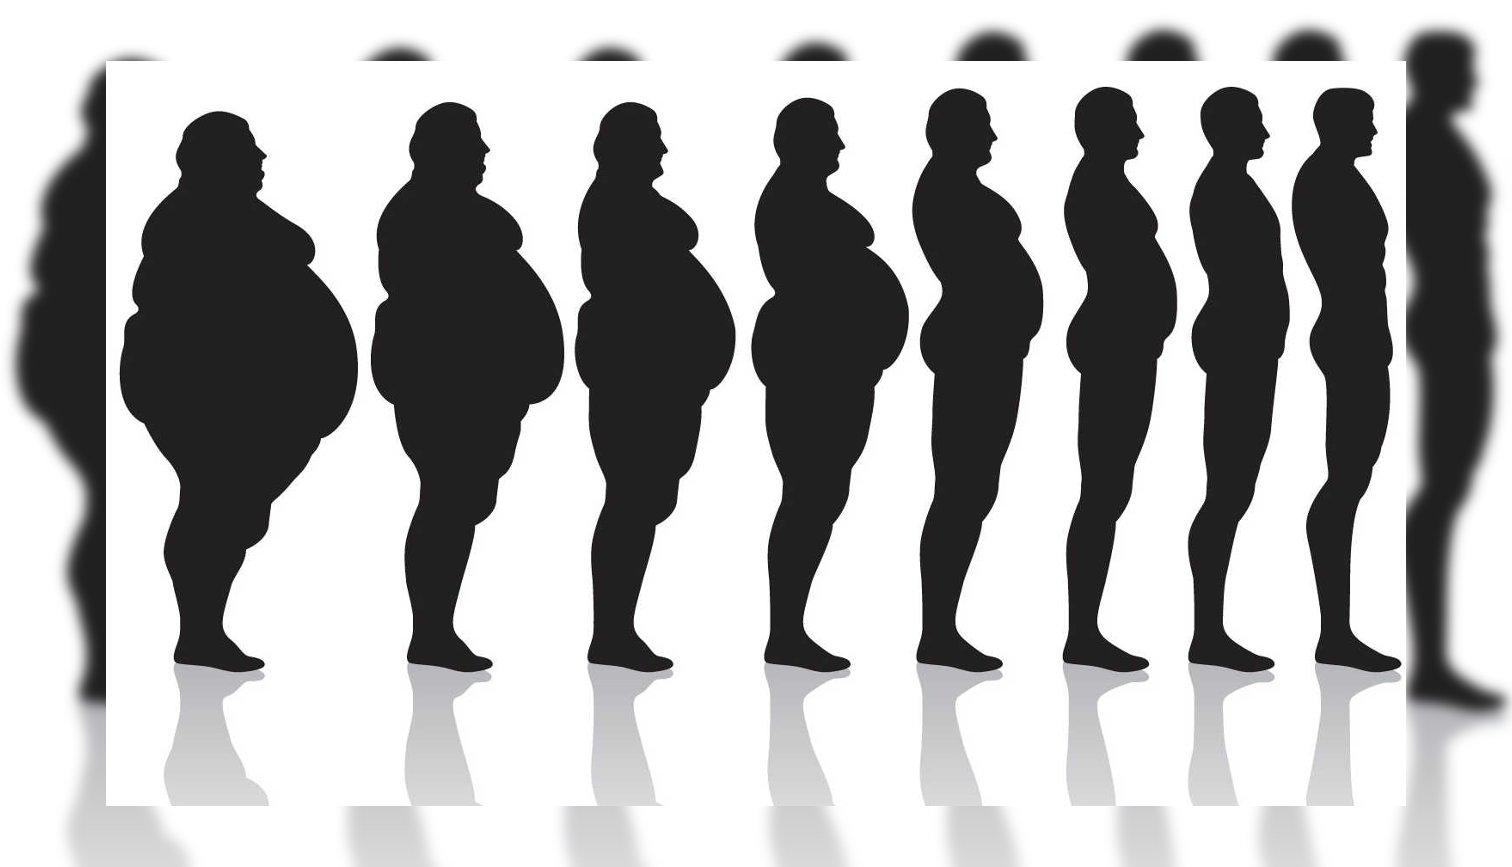 cuerpo adelgazar bajar peso gordo flaco